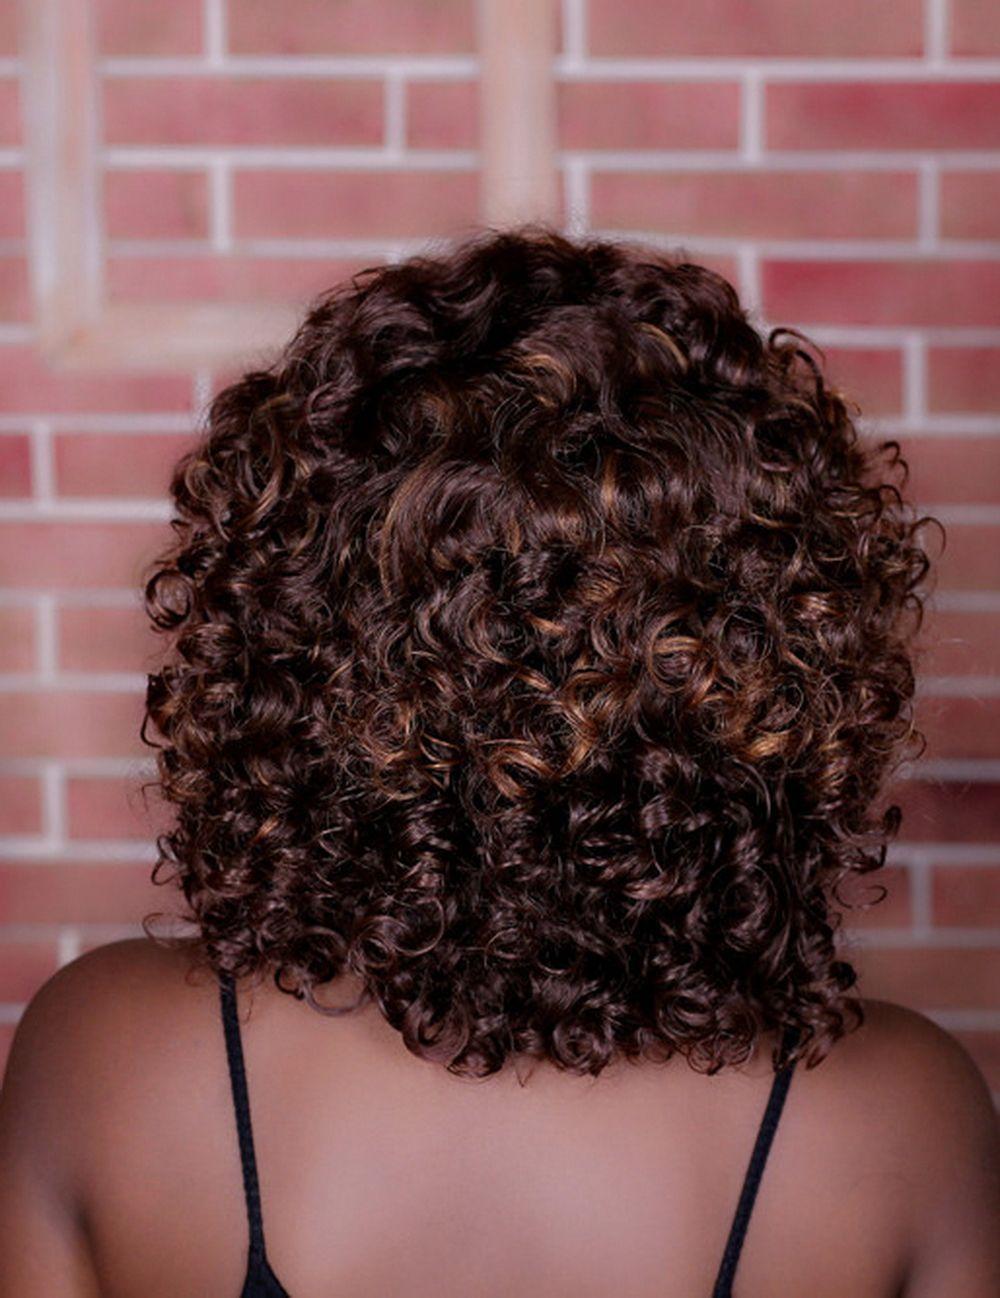 Xiu Zhi Mei Peruca Encaracolado Marrom Escuro Para As Mulheres Negras Resistente Ao Calor Sintético Africano Americano Penteados Curtos